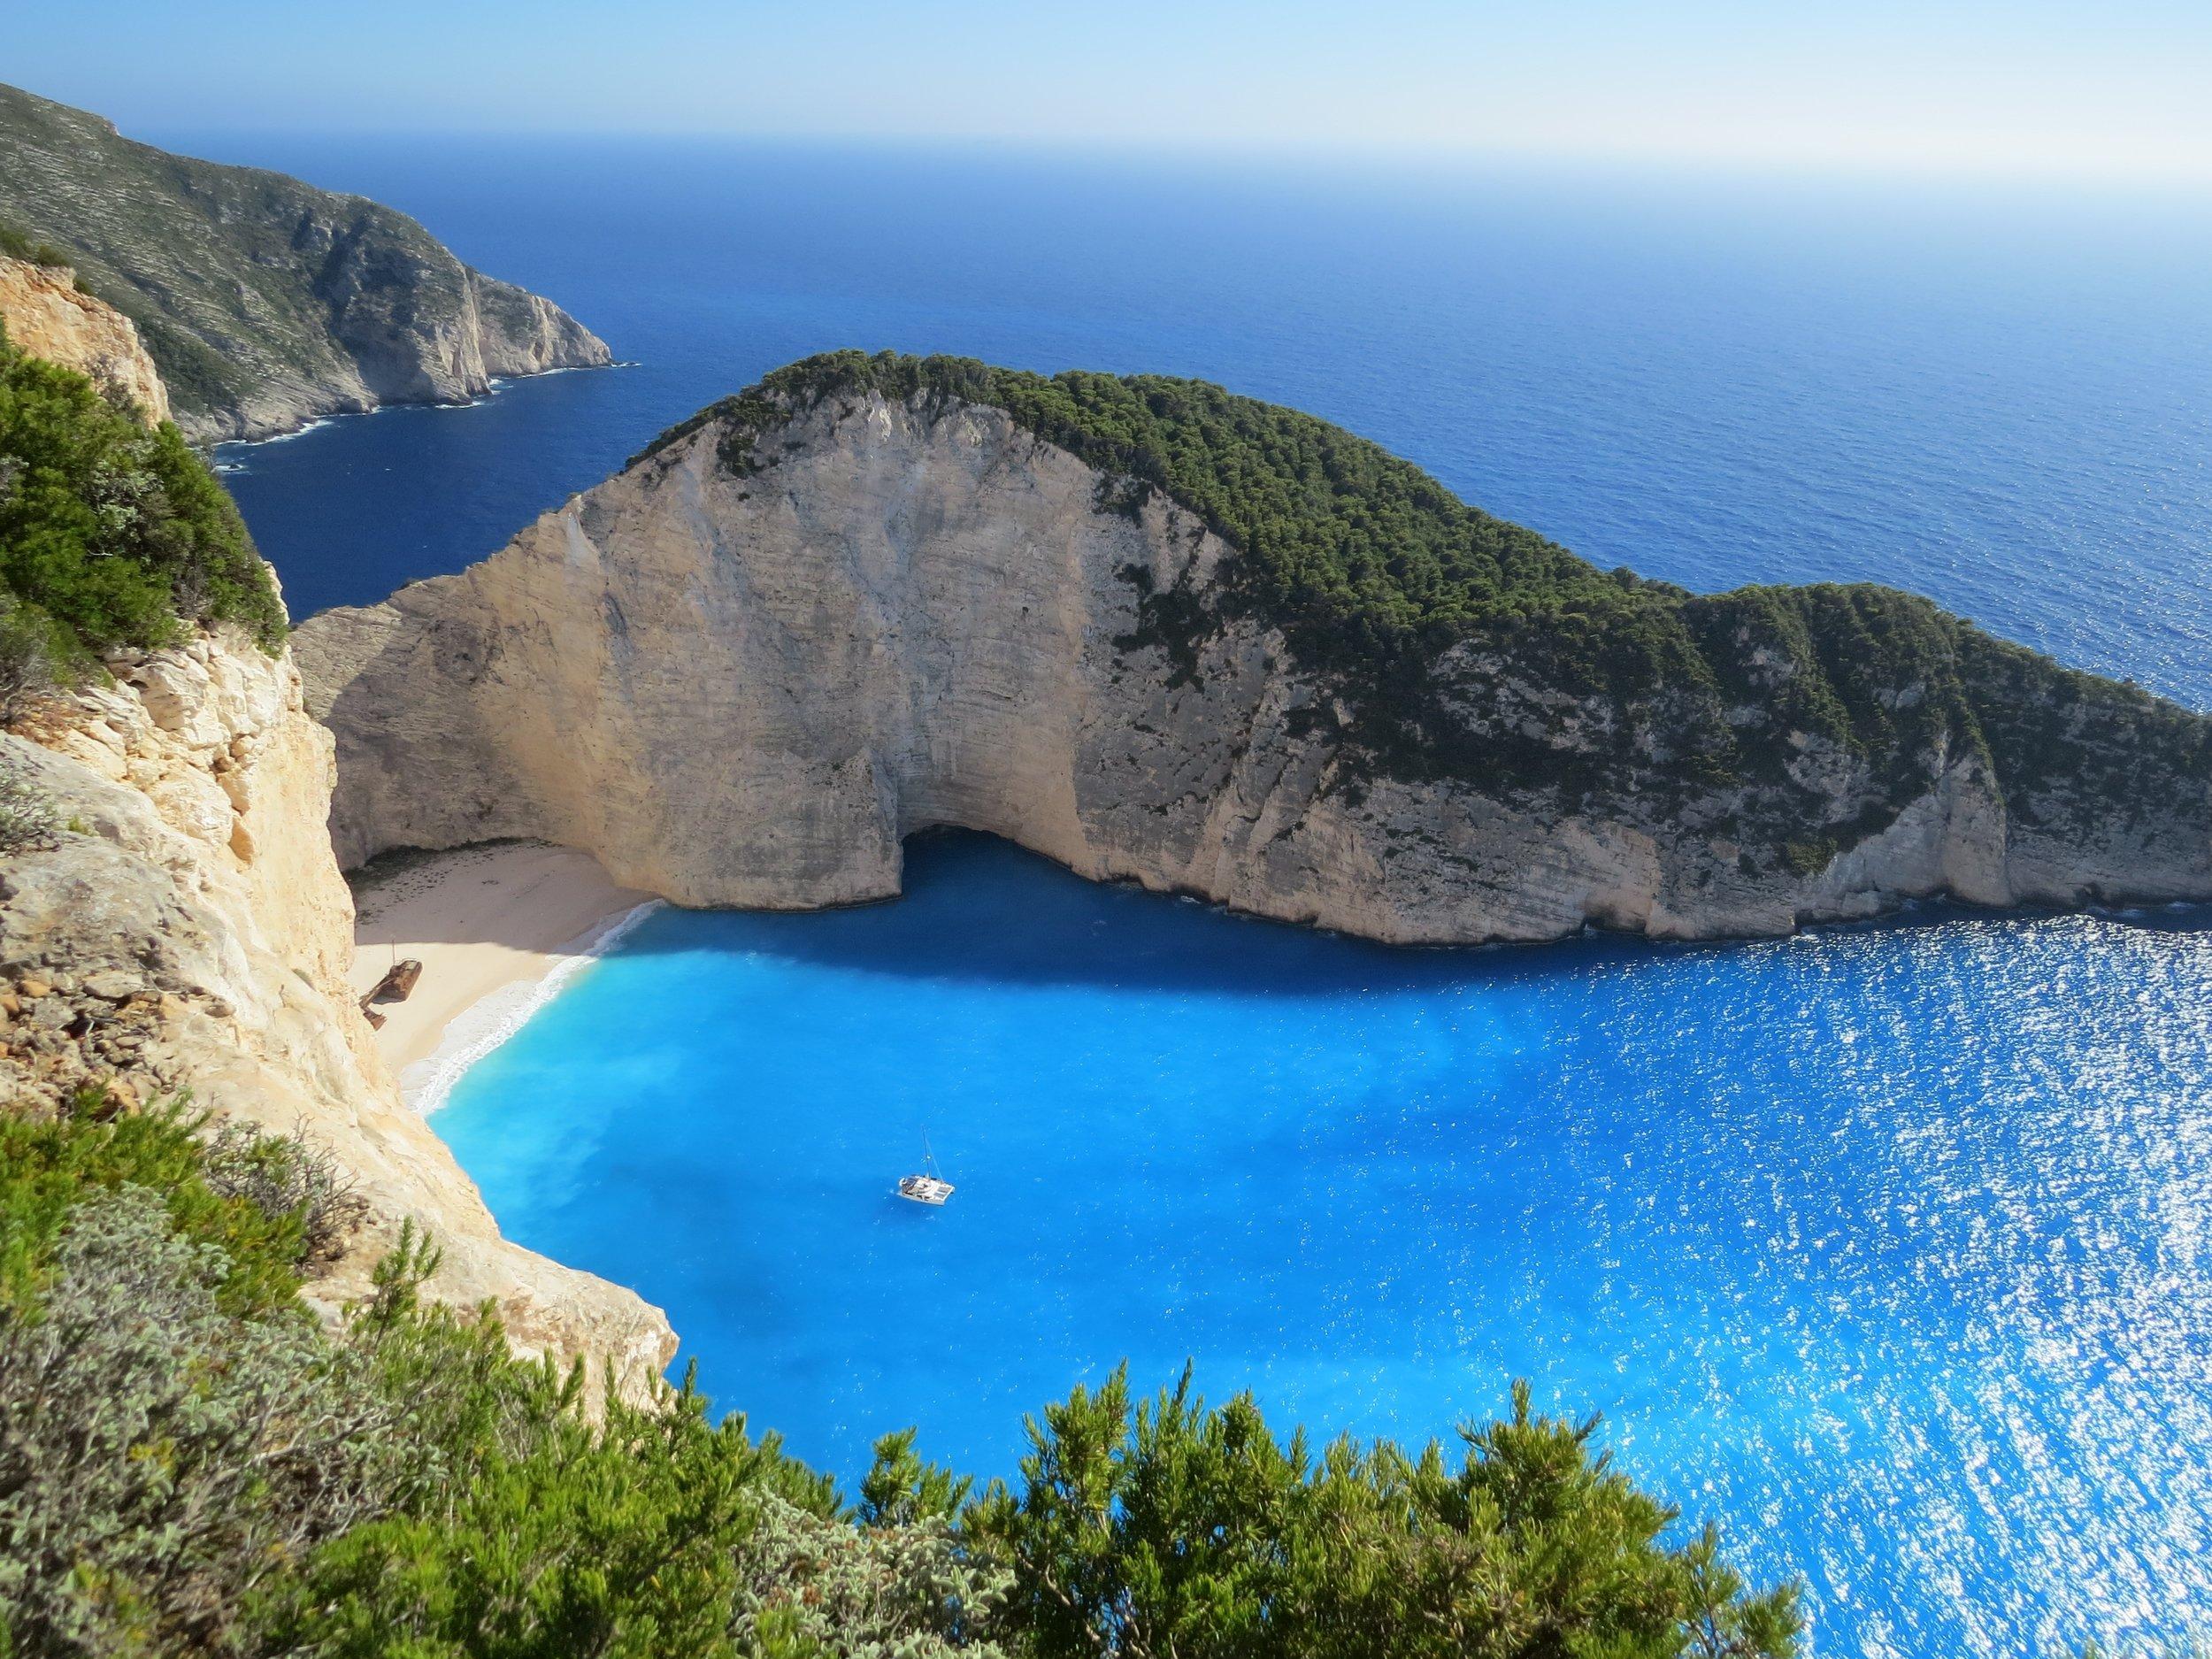 A peaceful cove in Greece Aegean Sea